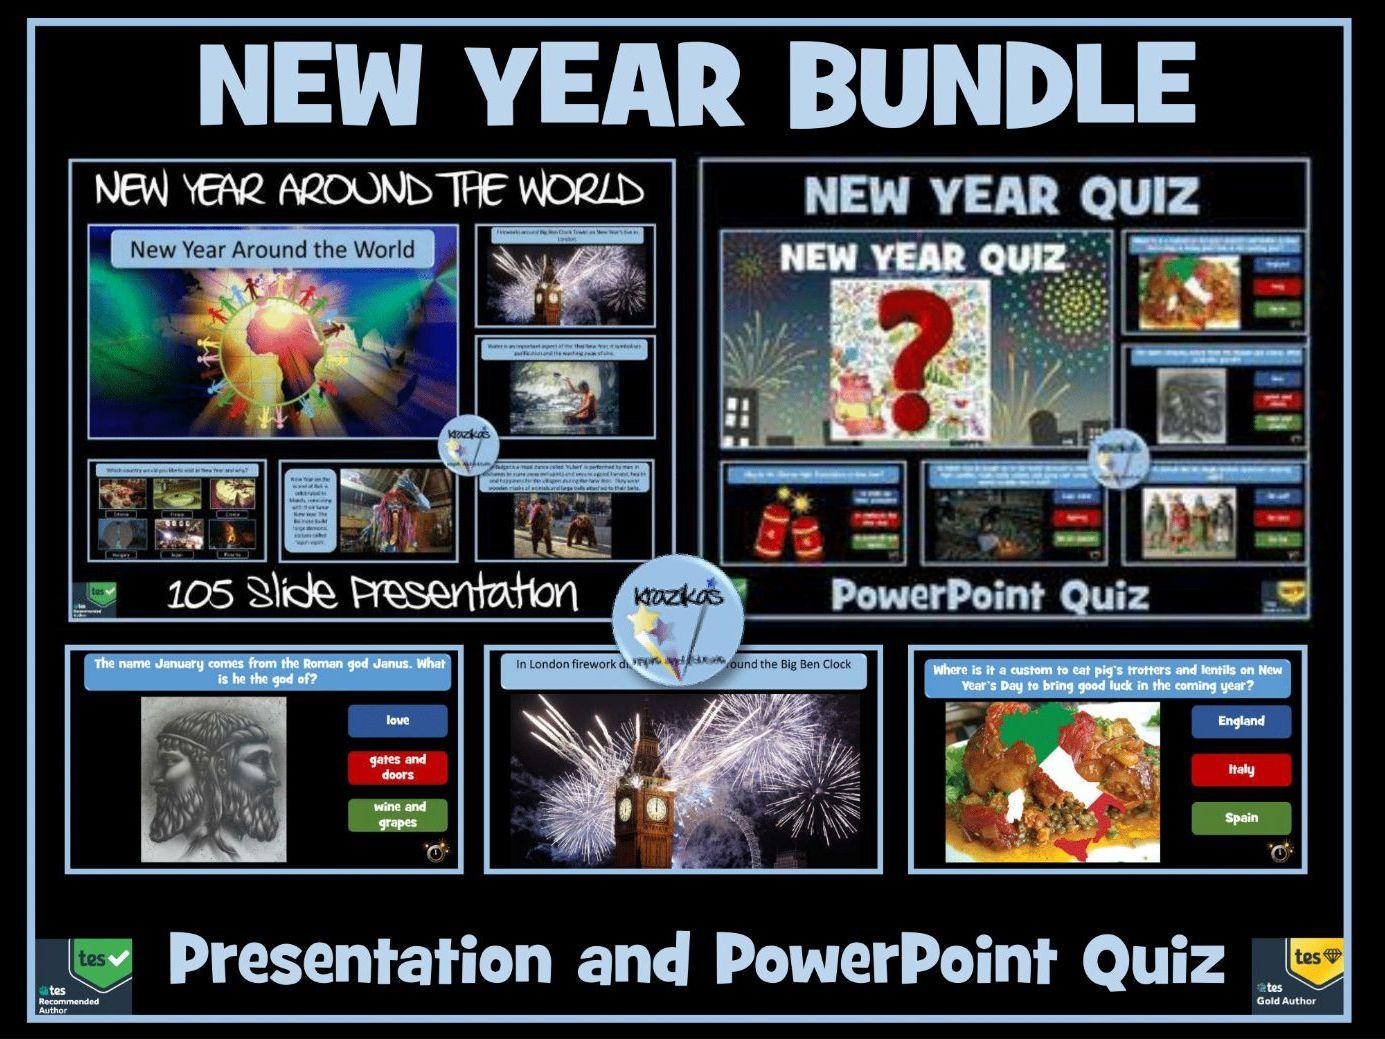 New Year Presentation and Quiz